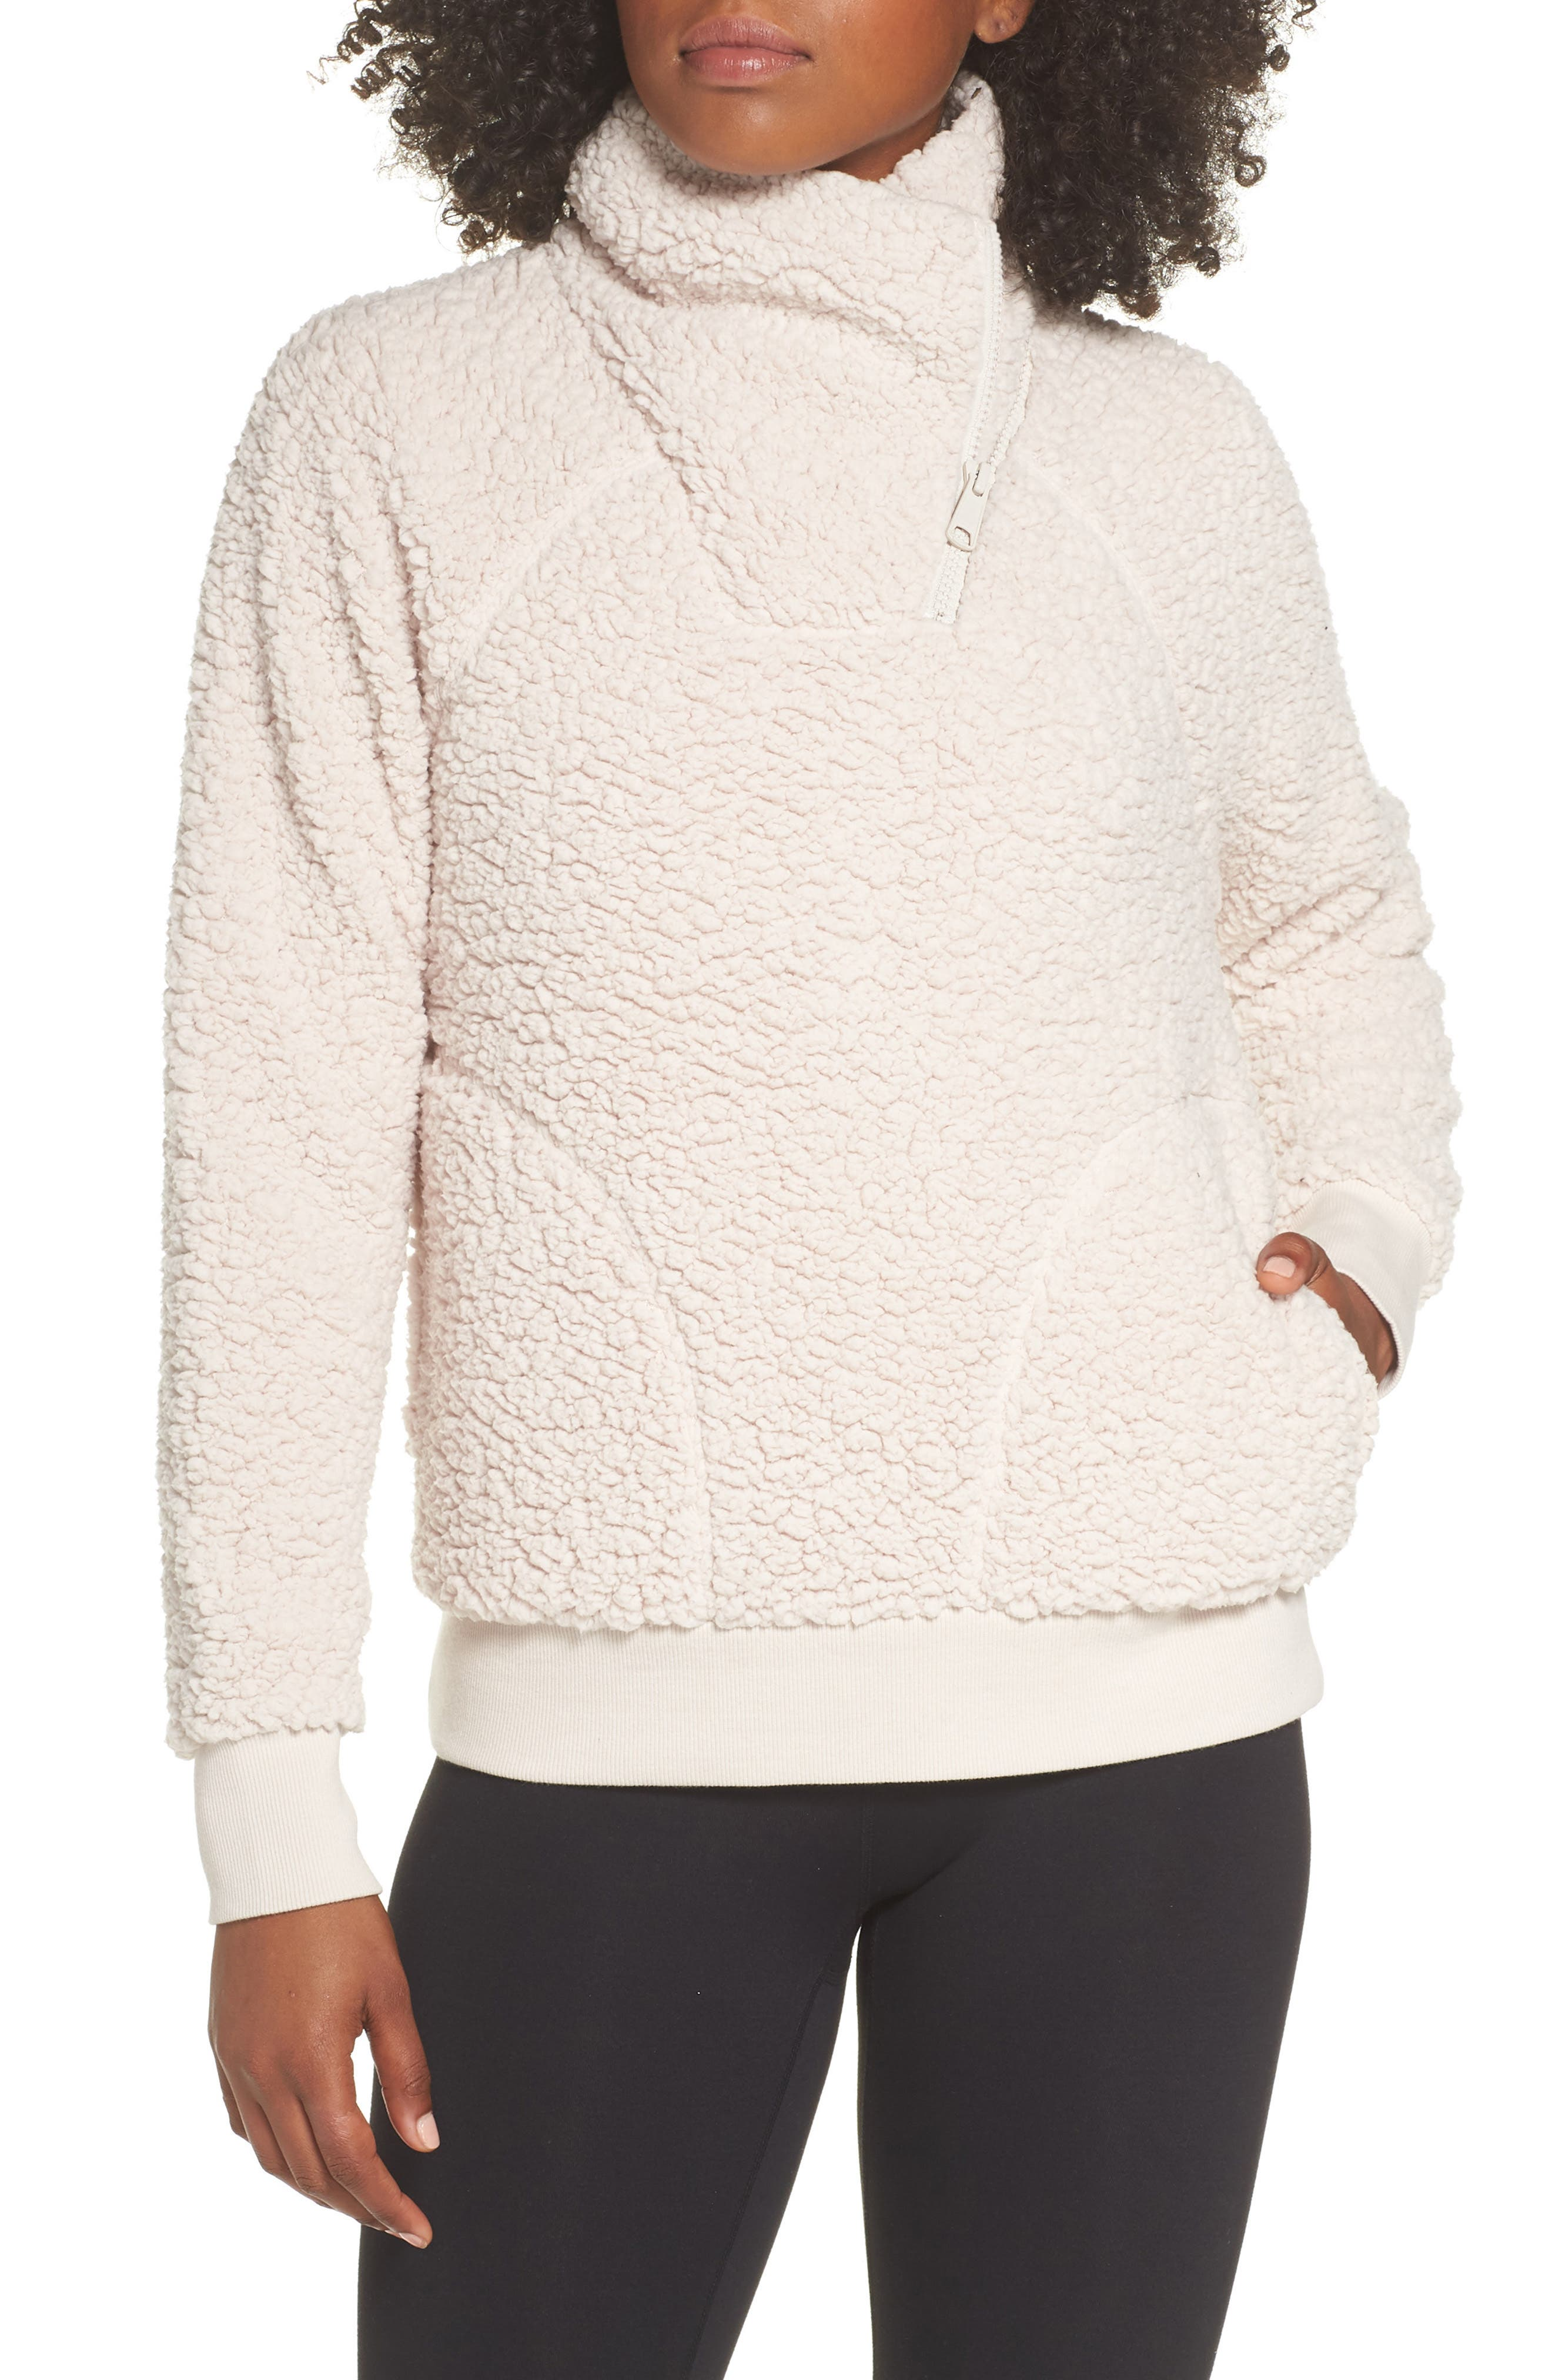 Shear Up Pullover,                         Main,                         color, GREY CRYSTAL